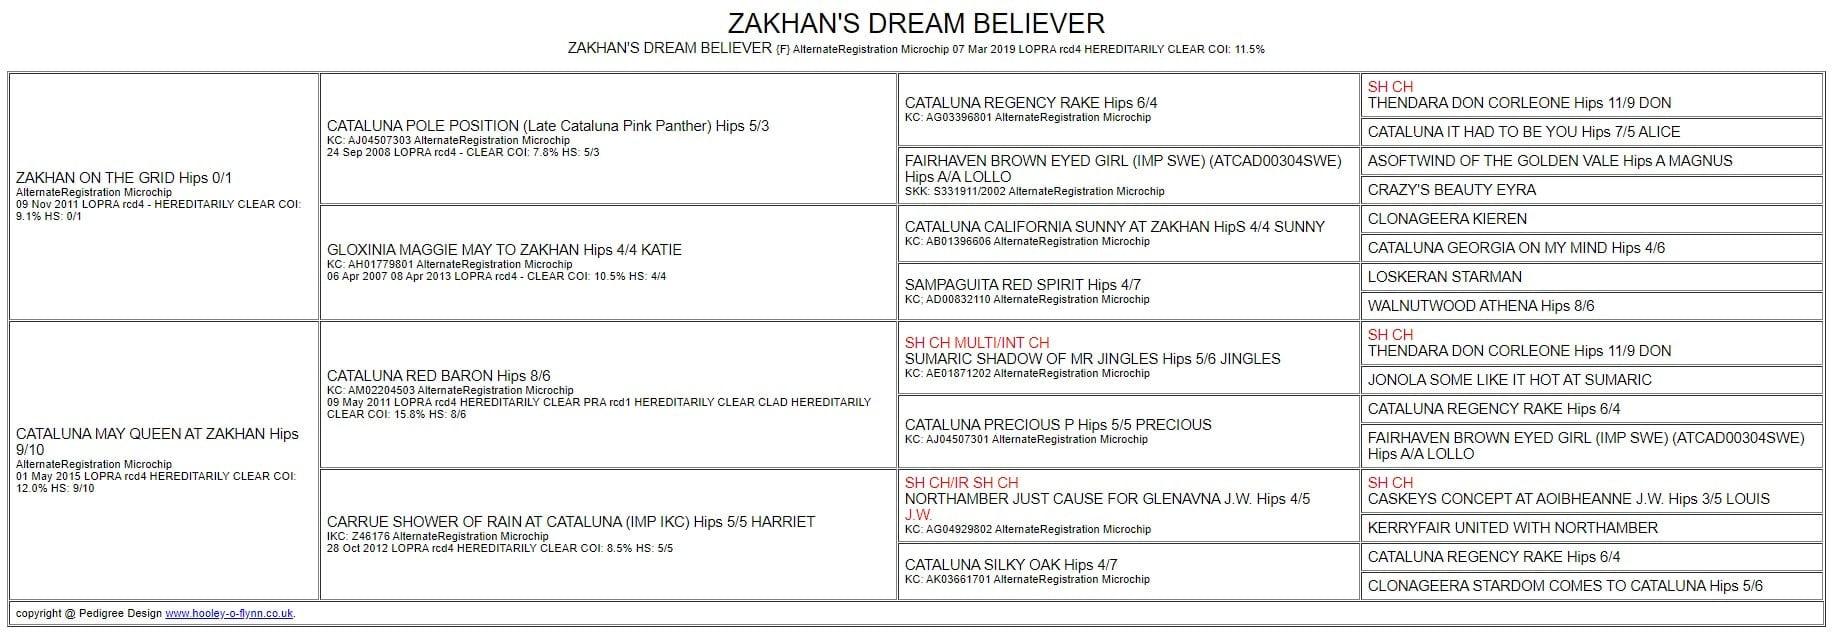 ZAKHANS DREAM BELIEVER